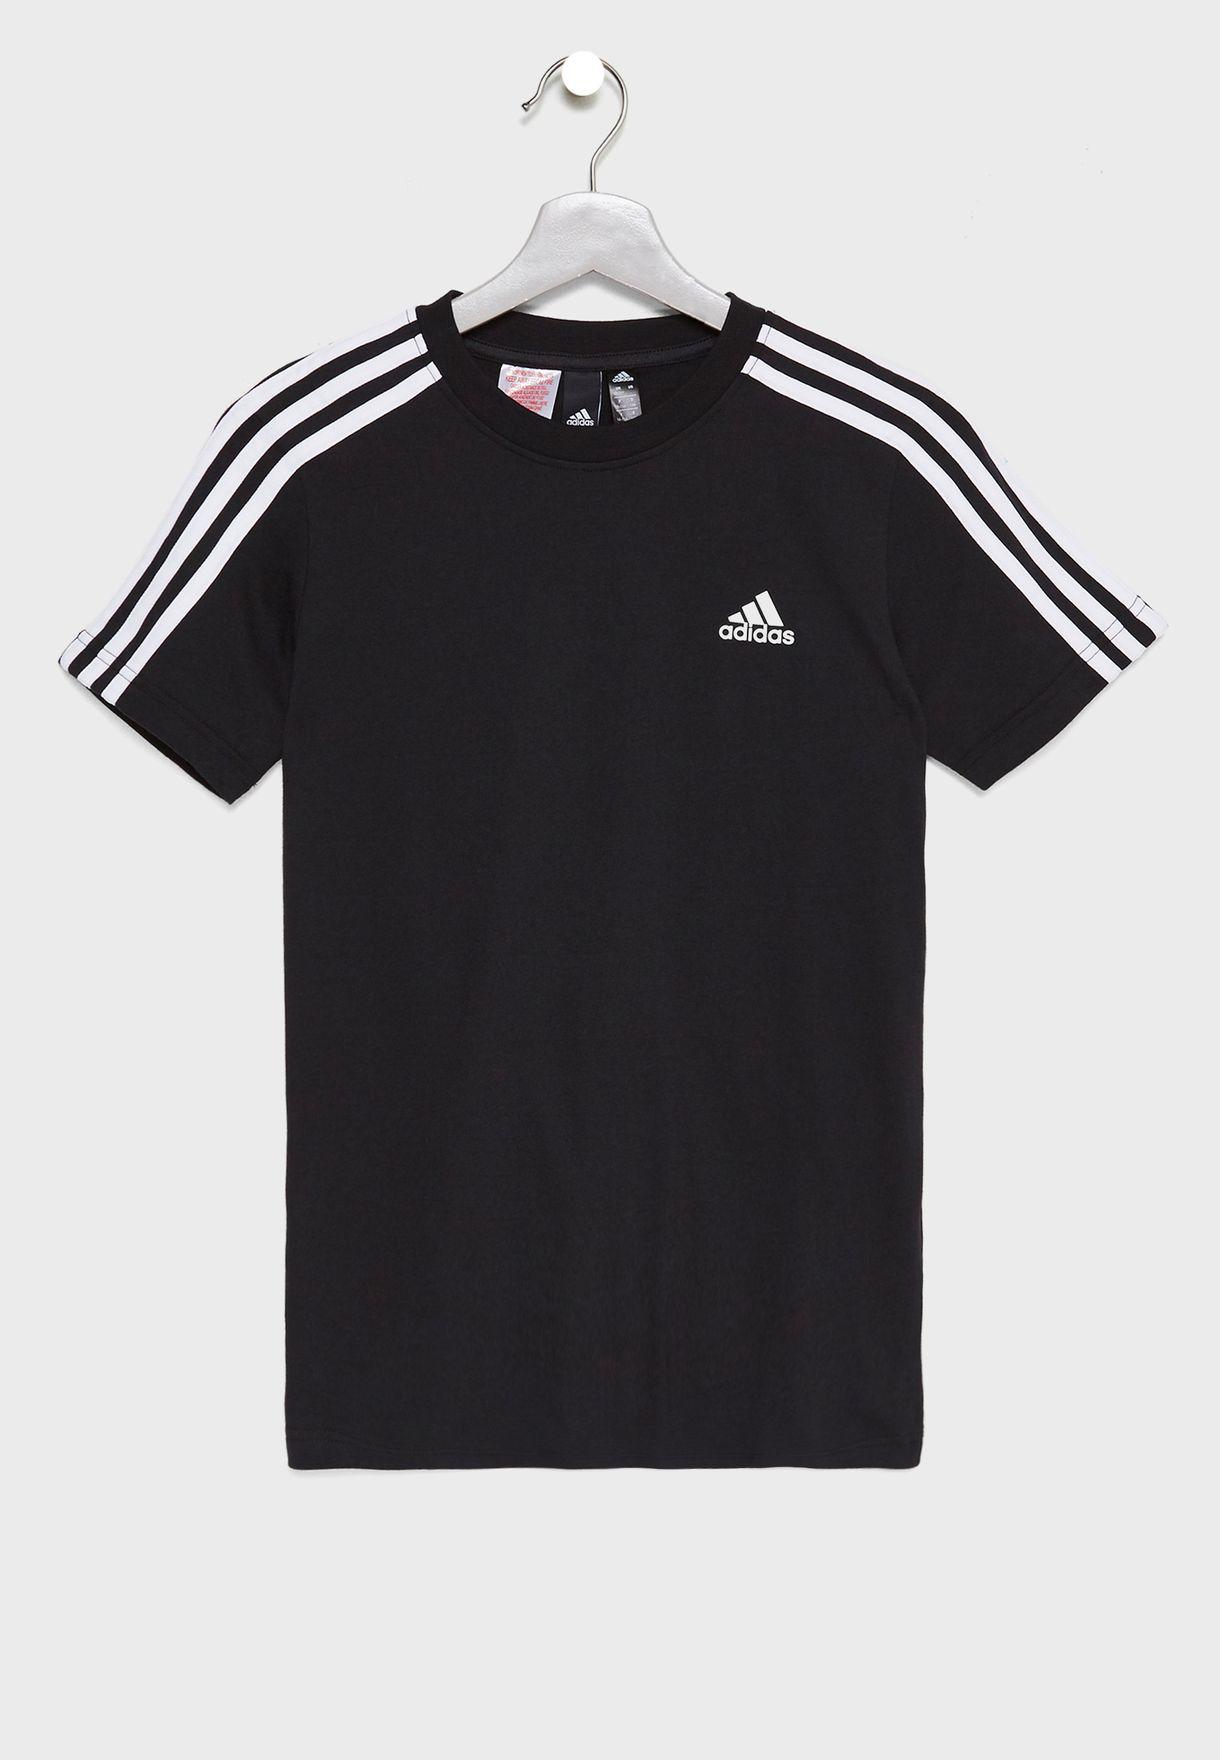 7e102505f Shop adidas black Youth 3 Stripe T-Shirt DJ1759 for Kids in UAE ...